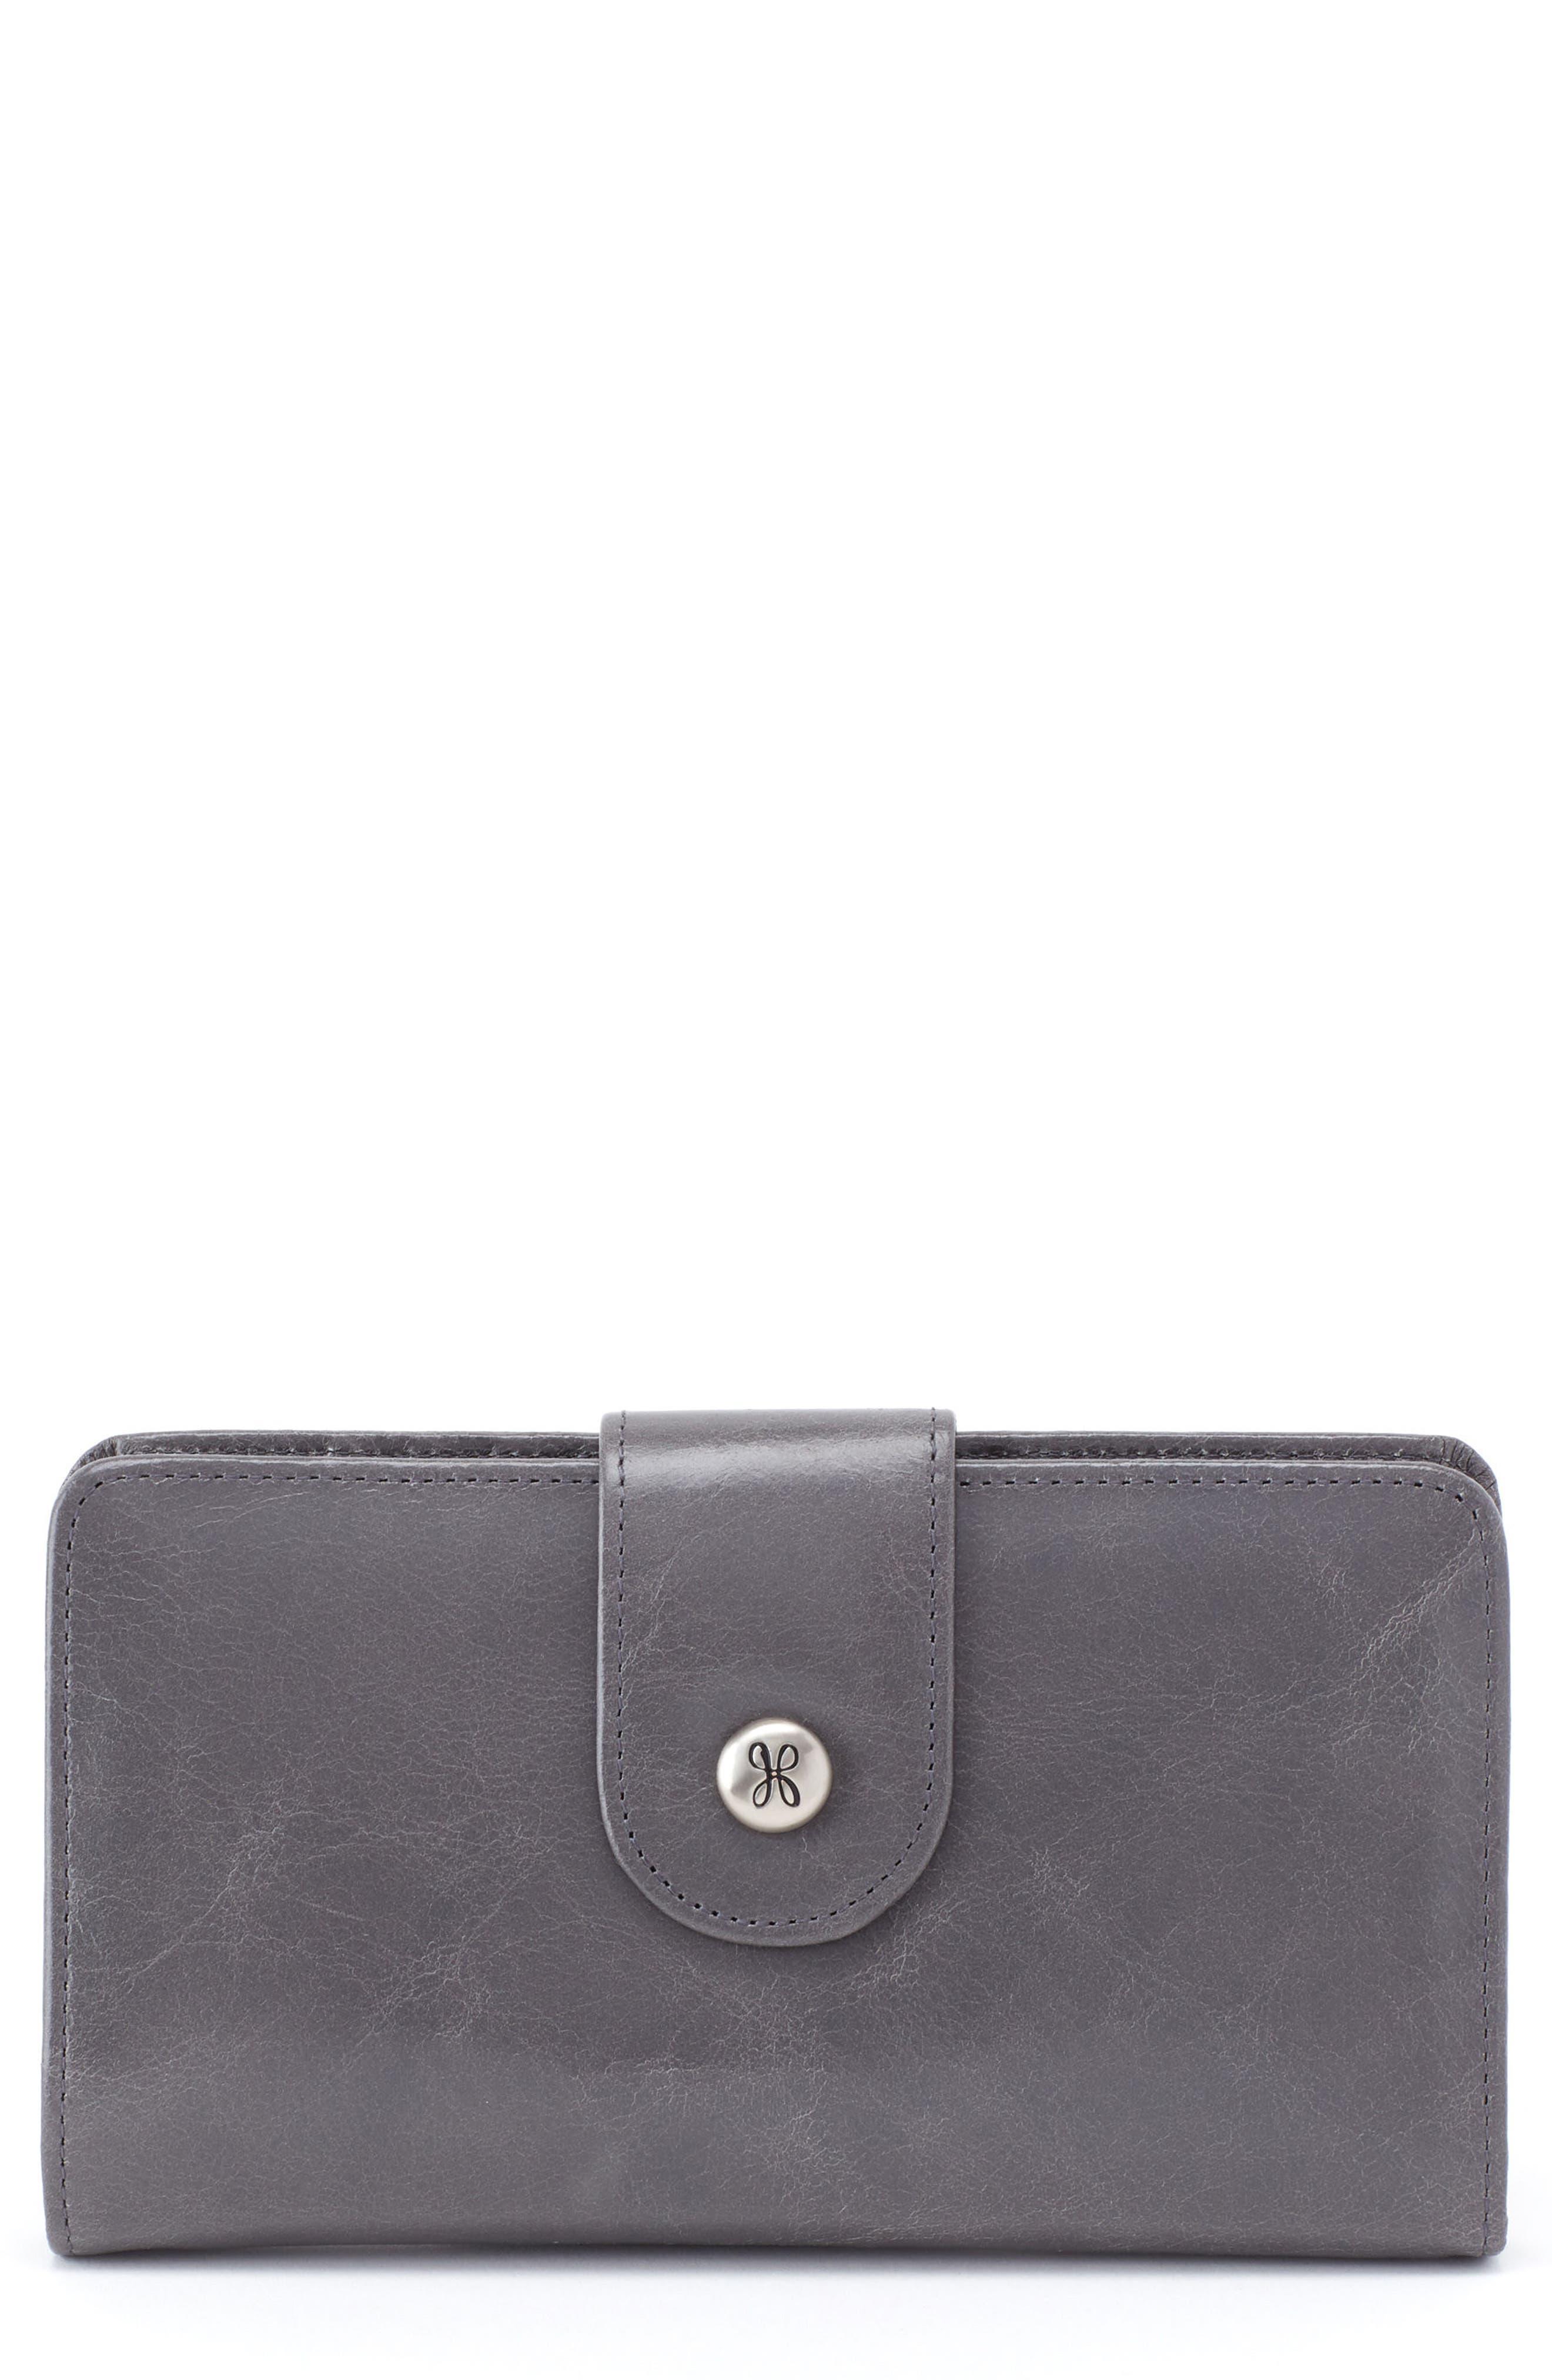 'Danette' Glazed Leather Continental Wallet,                         Main,                         color, Graphite